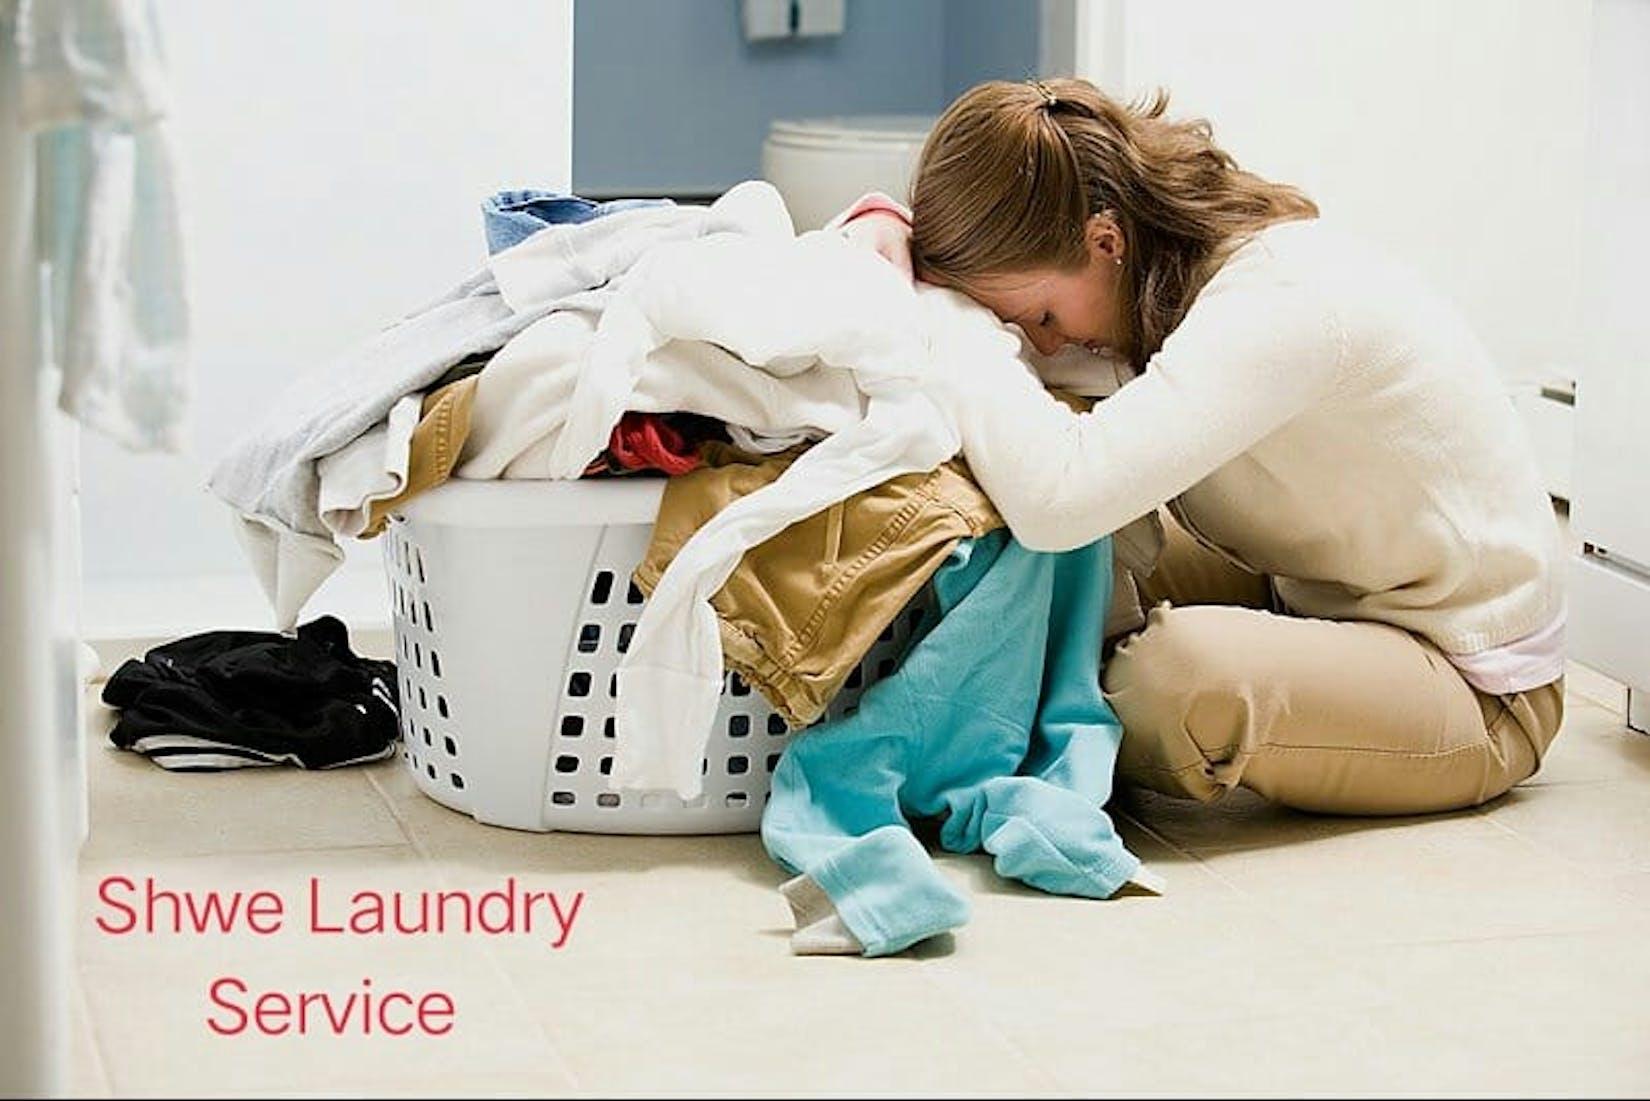 Shwe Laundry Service   Beauty